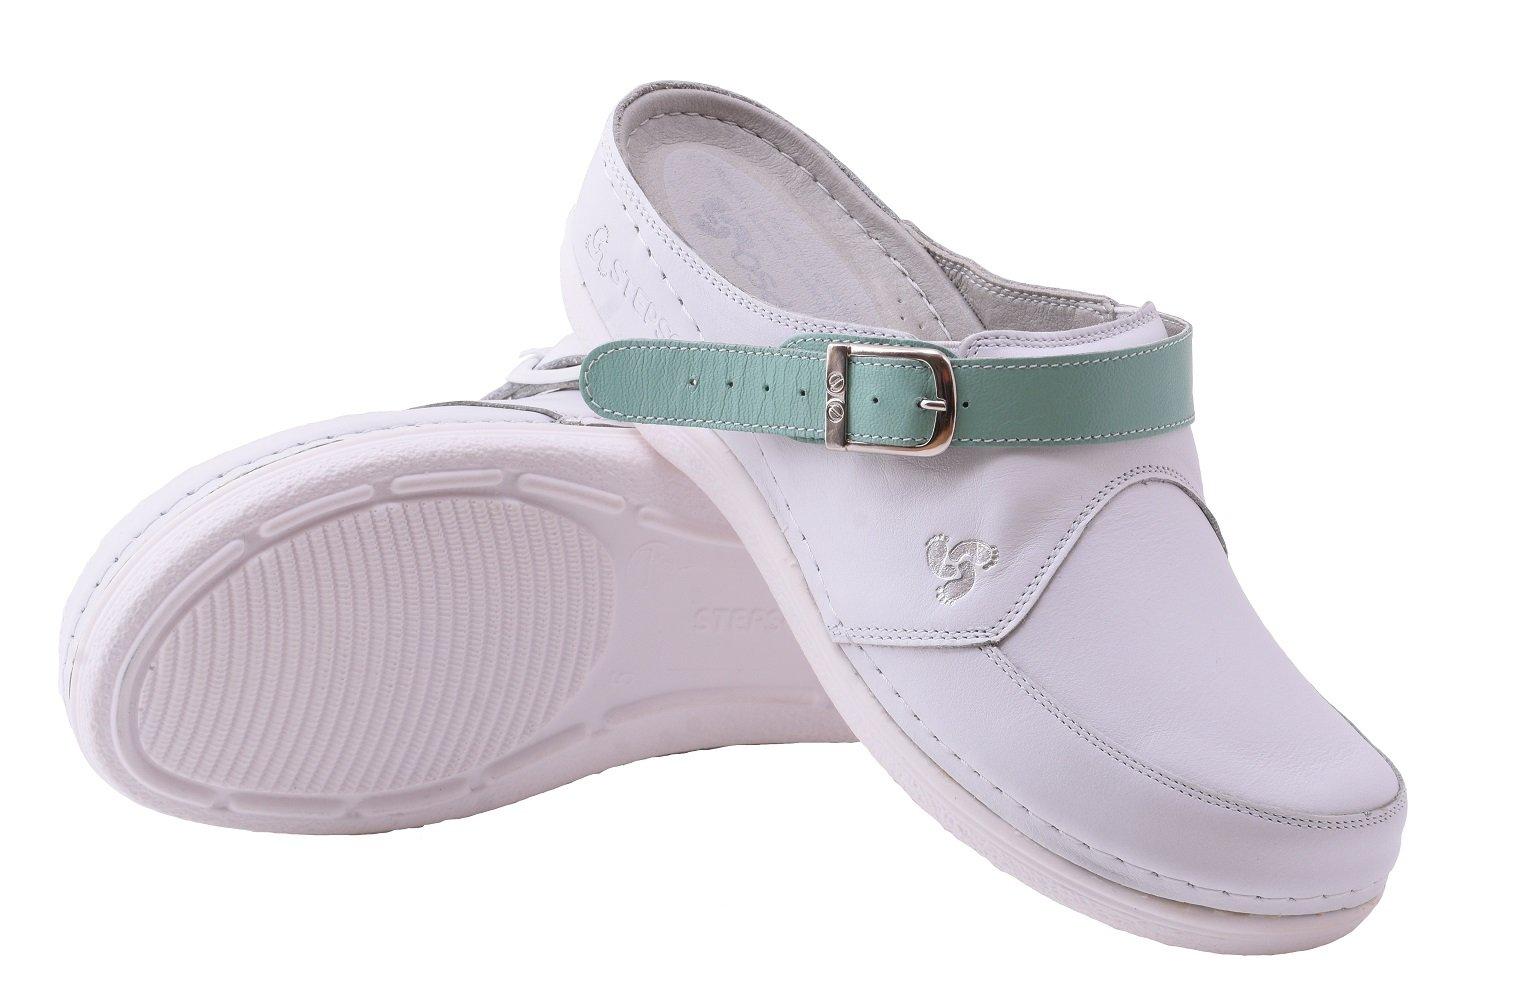 STEPSO Clogs Women's White Leather Handmade Lightweight Professional Comfort Nursing